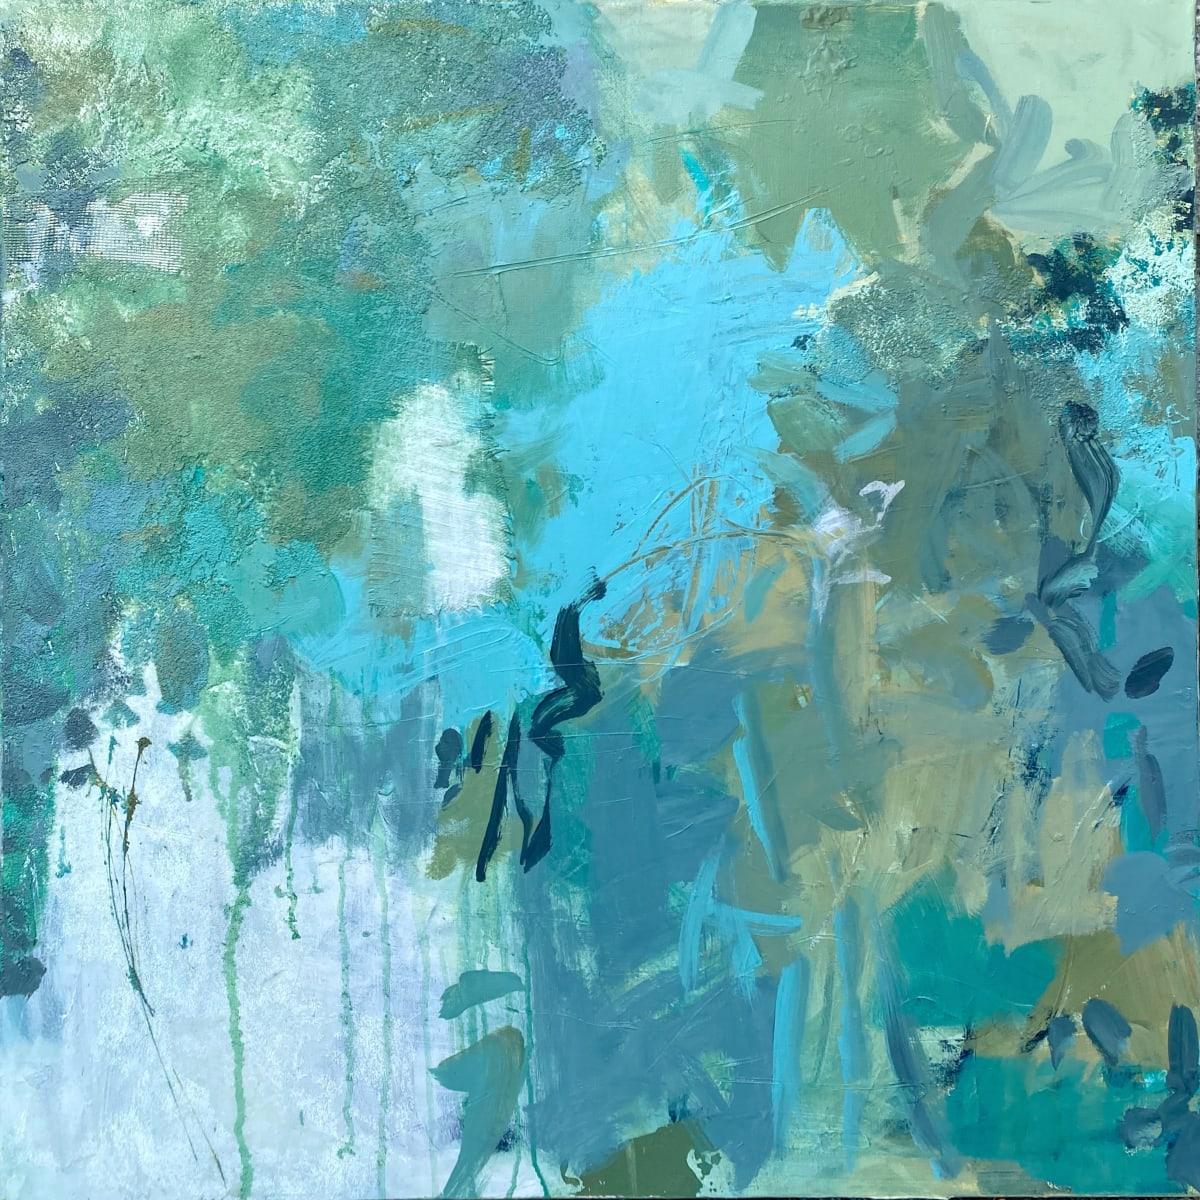 Solitude by Michelle Marra